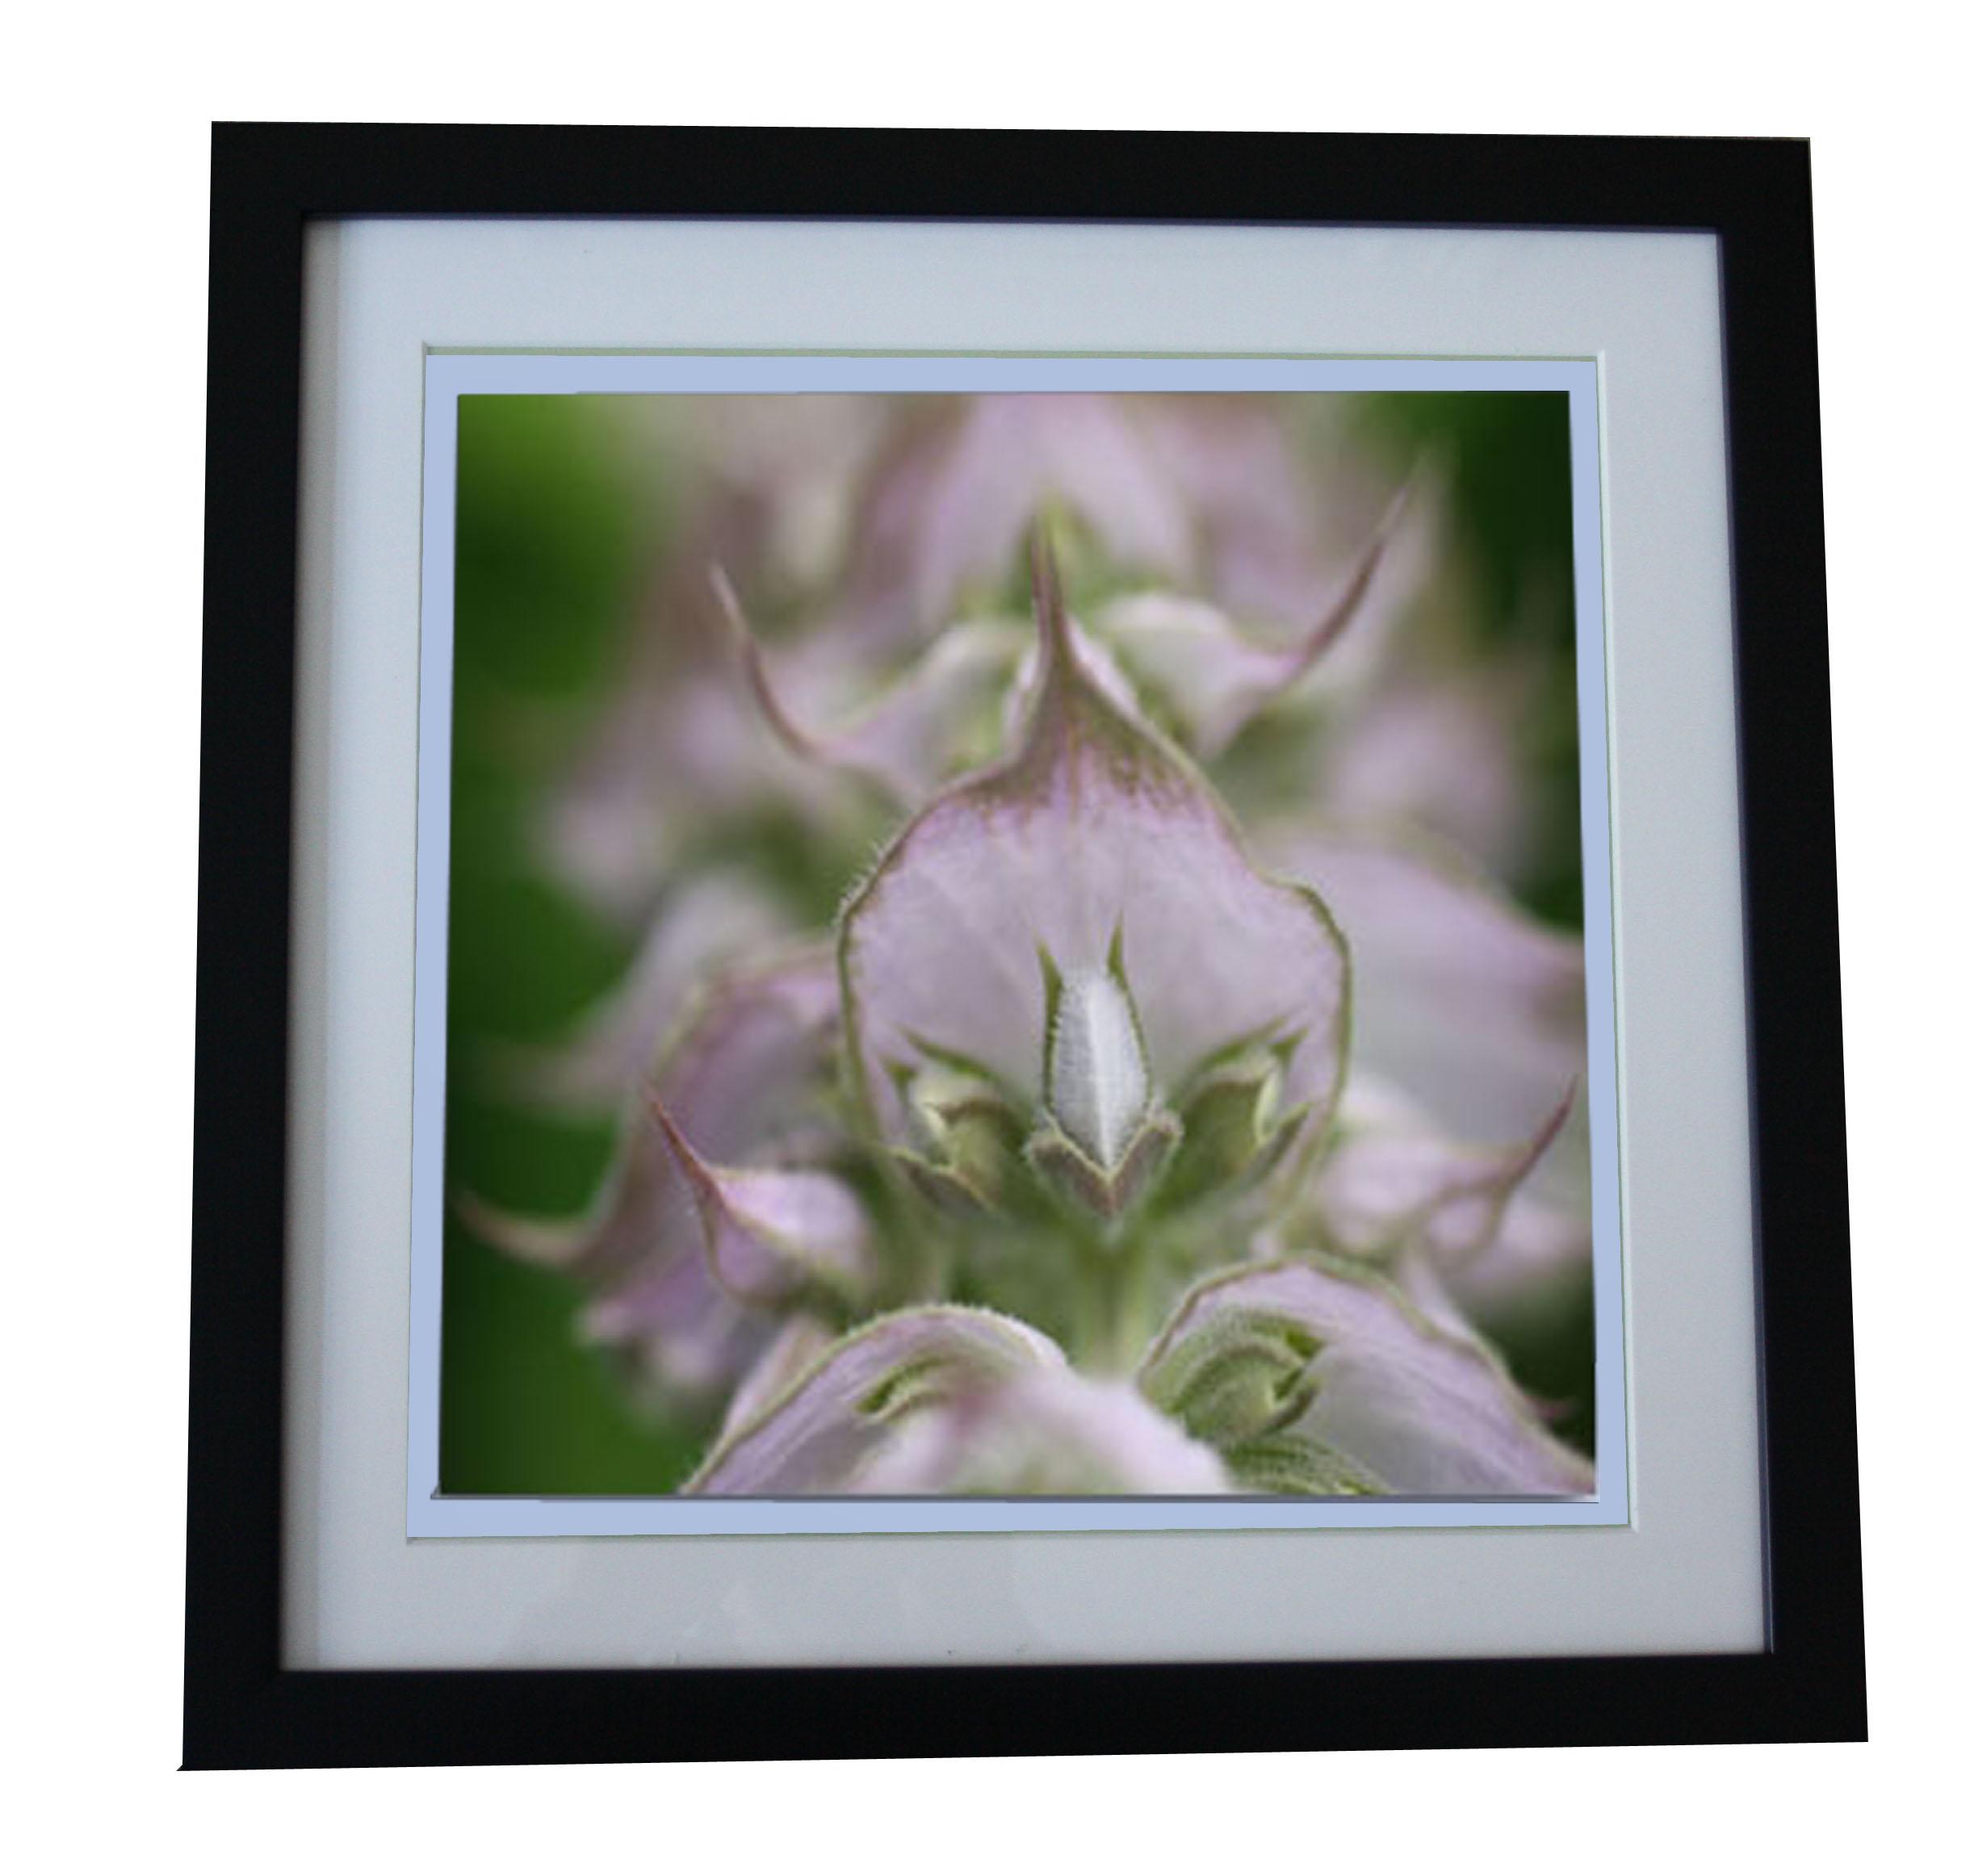 flora perpetua Rahmenbild Melissenblüte Melissenblüte - Motiv B23 ...